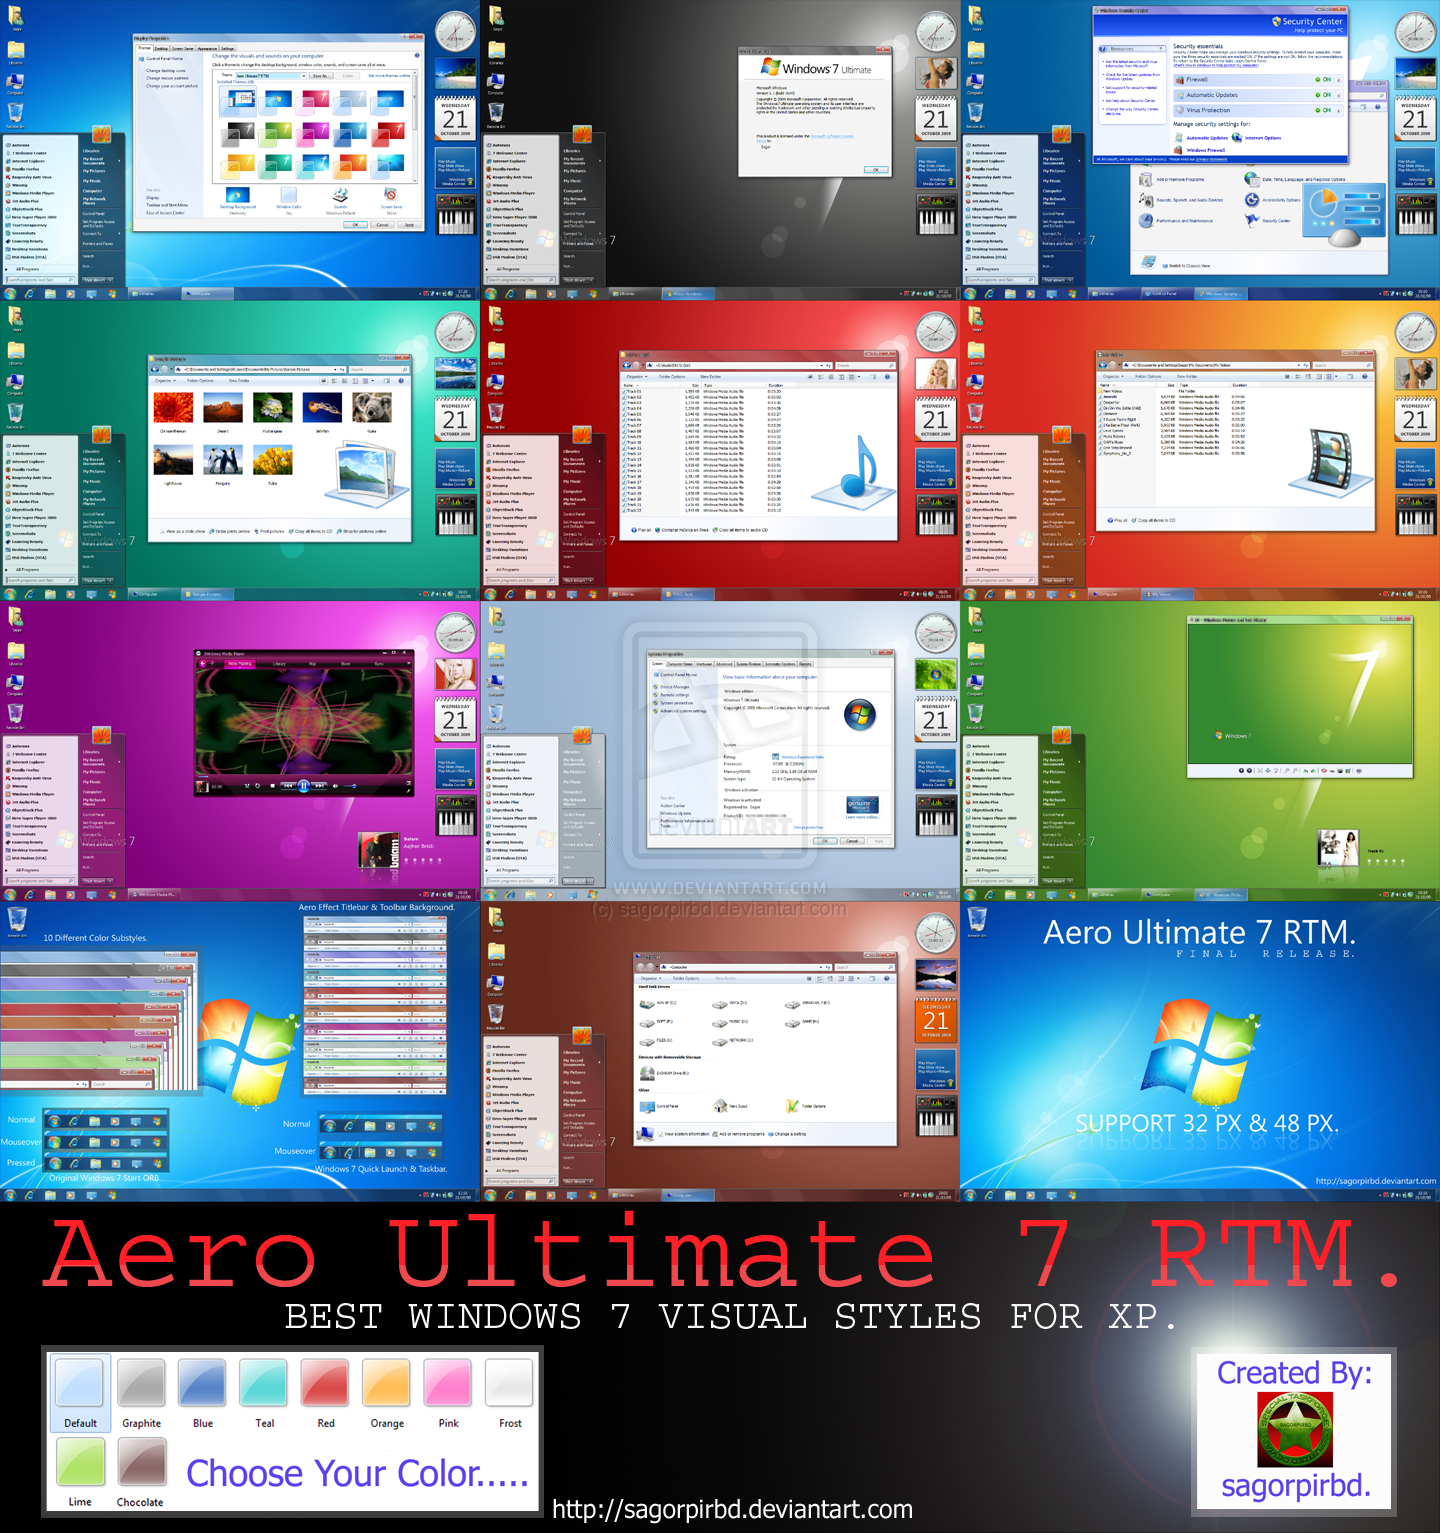 Aero Ultimate 7 RTM by sagorpirbd